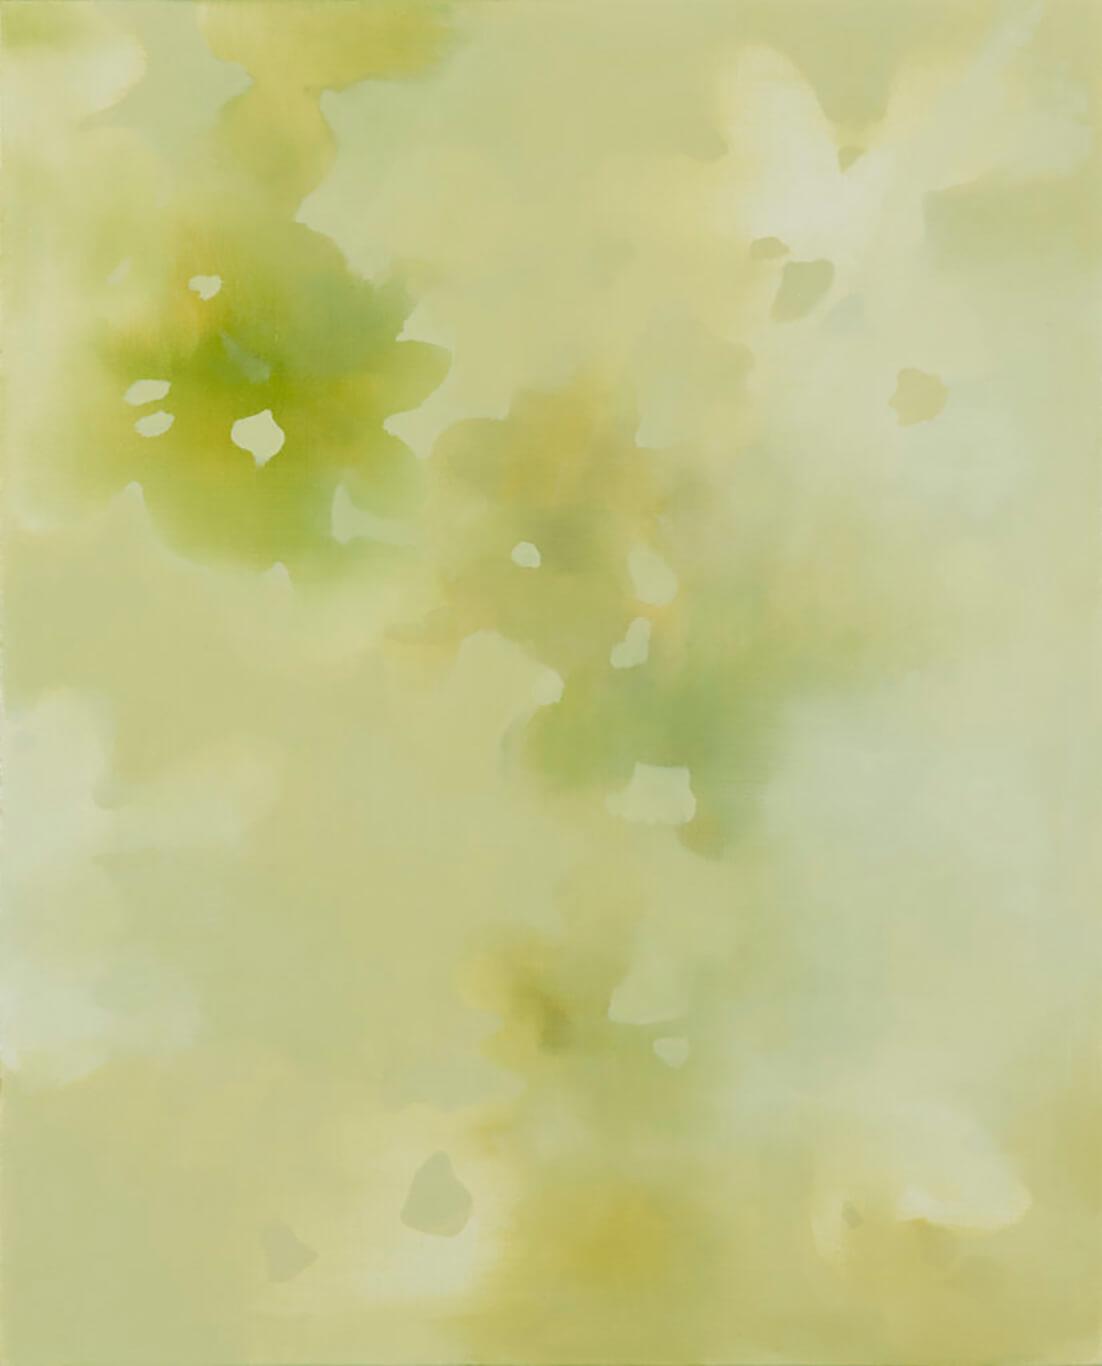 eureka-202104-井上絢子 展